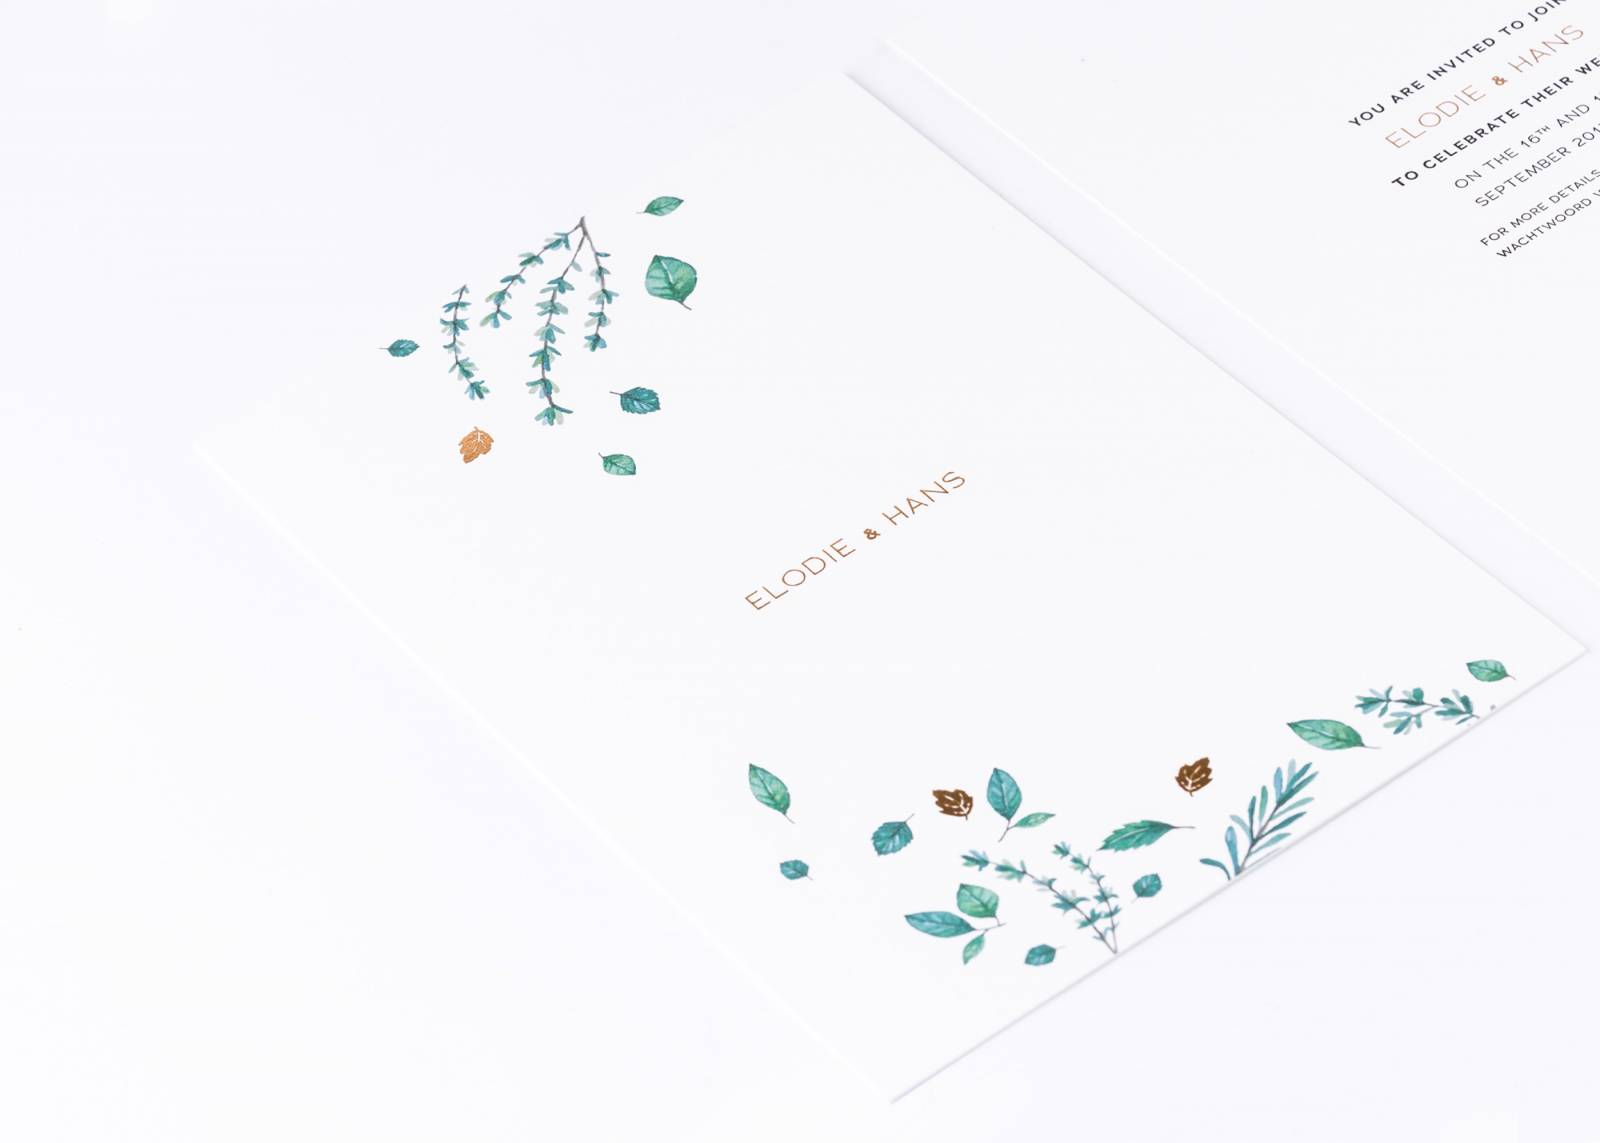 House of Weddings Uitgelijnd Drukwerk Uitnodiging Wedding Stationary Huwelijk Letterpress (1) (Custom)